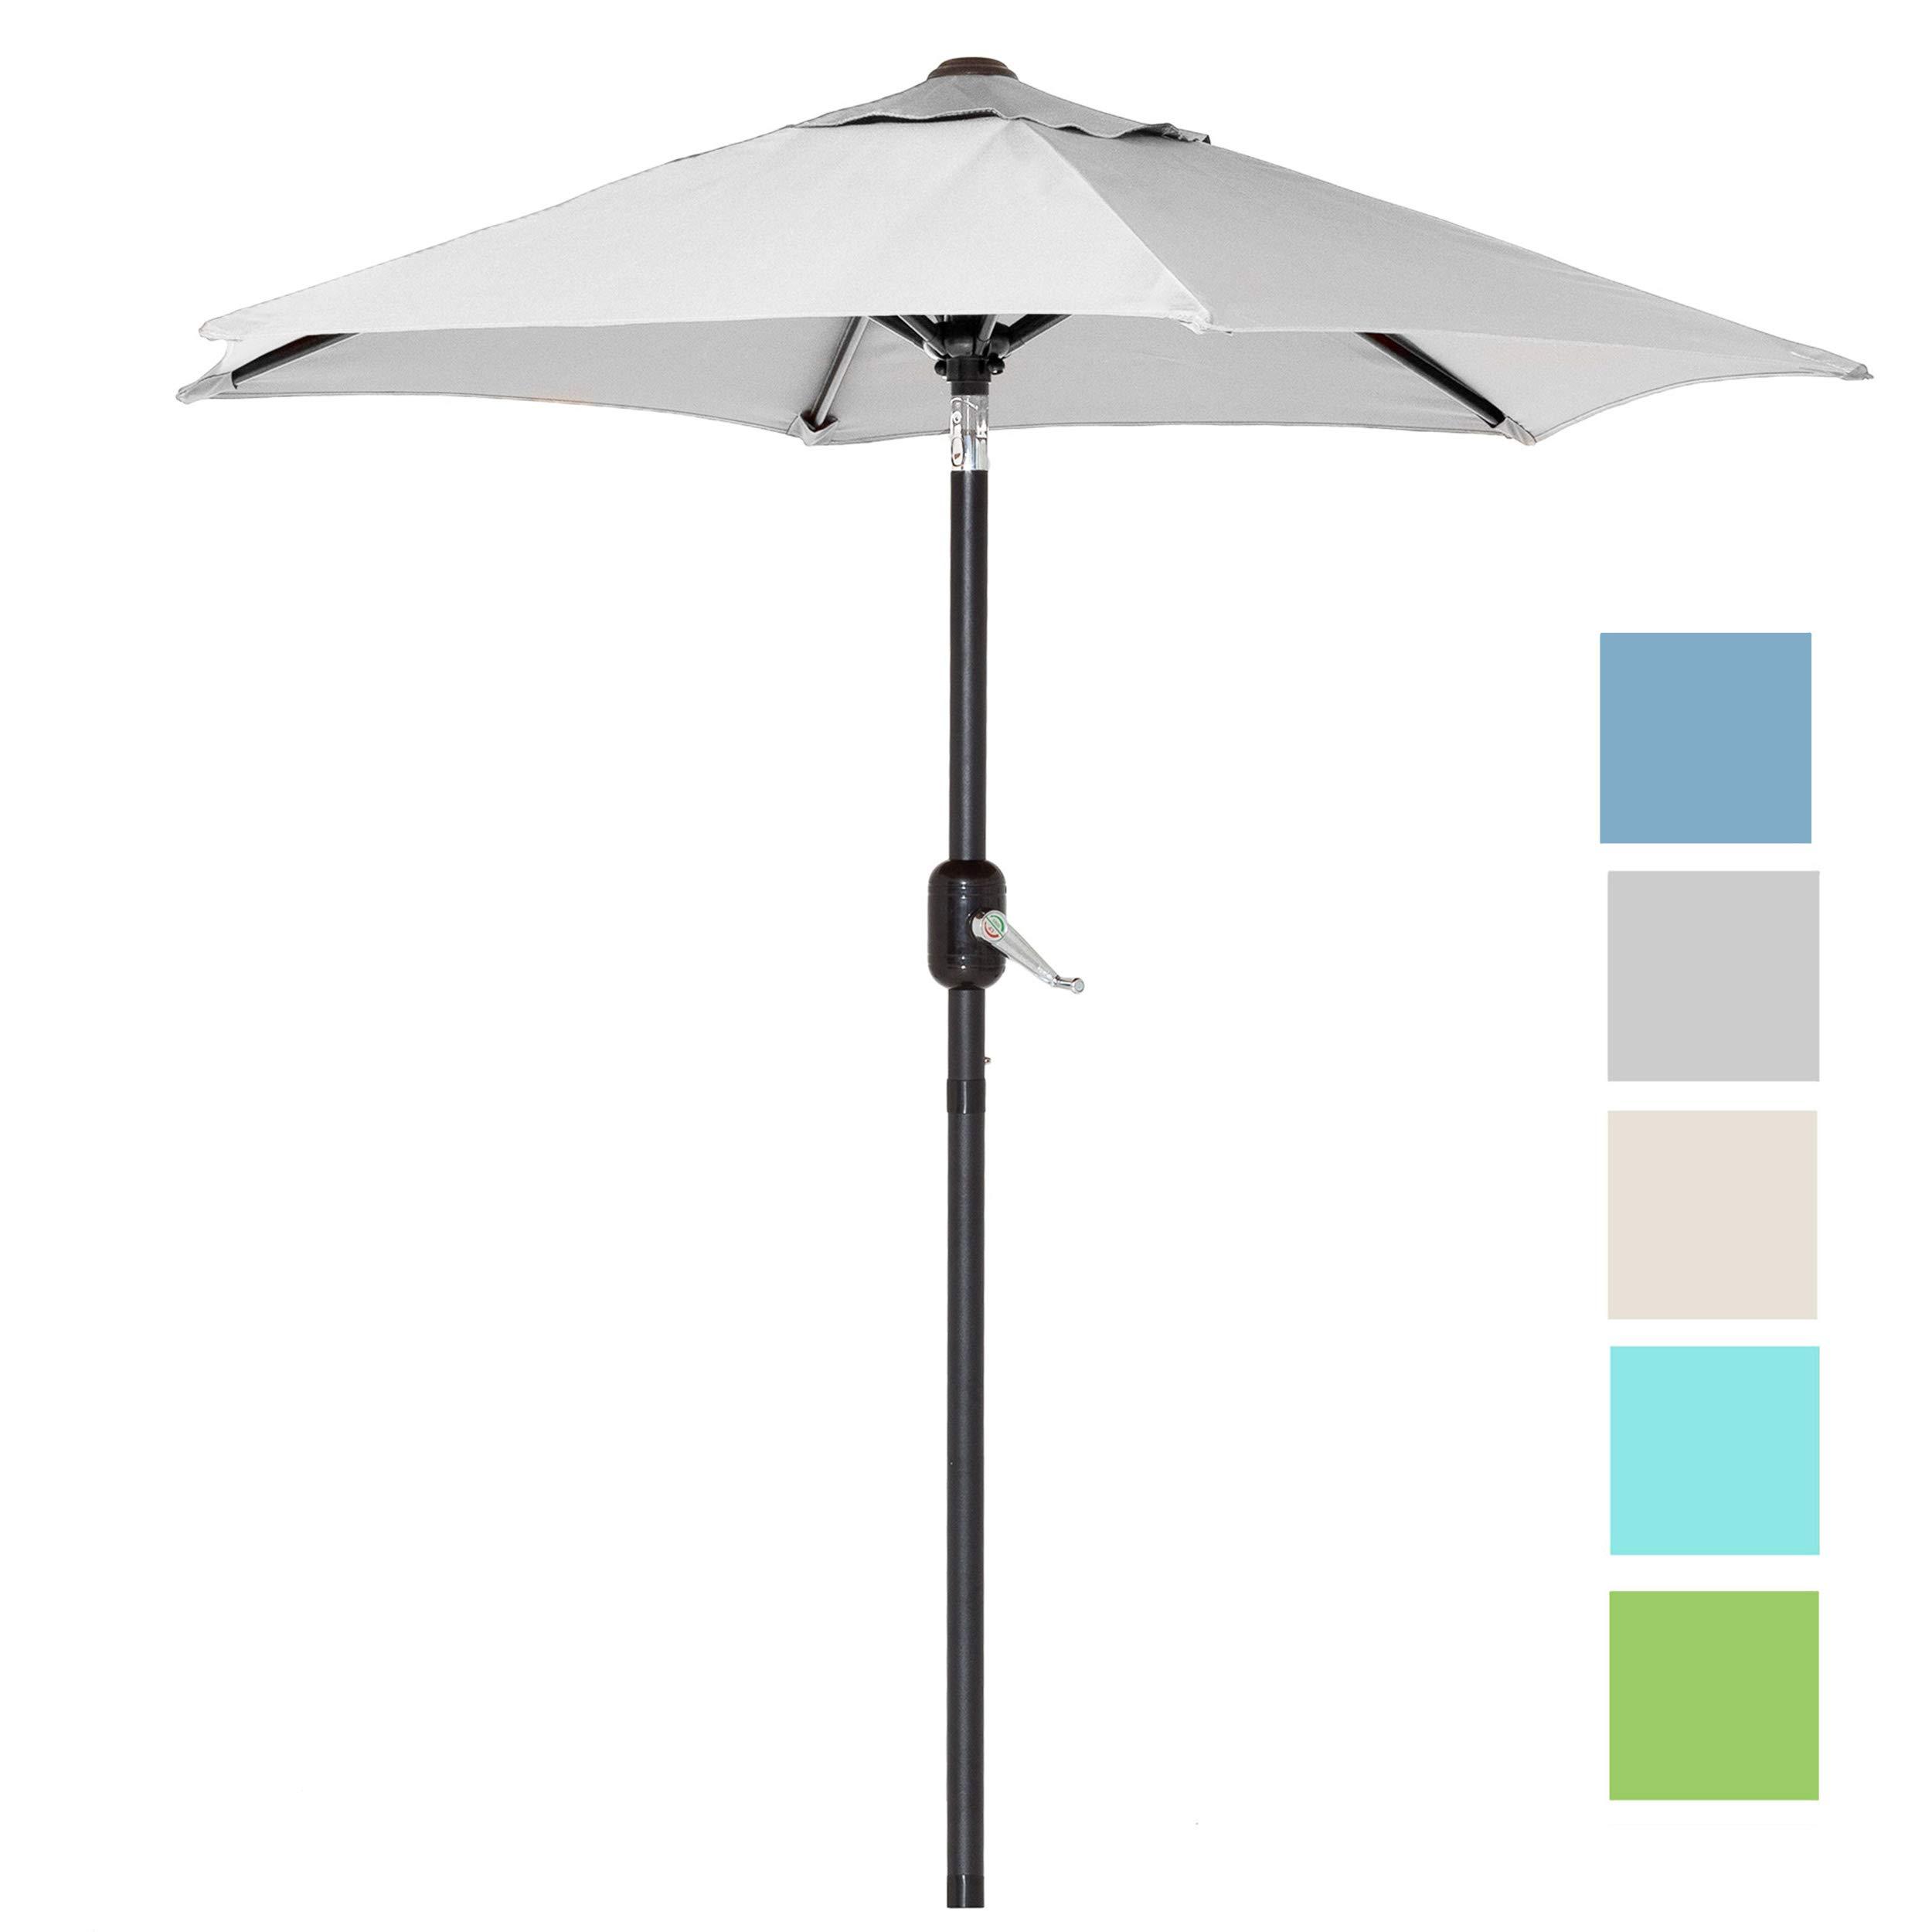 6 Ft Outdoor Patio Umbrella with Aluminum Pole, Easy Open/Close Crank and Push Button Tilt Adjustment - Gray Market Umbrellas